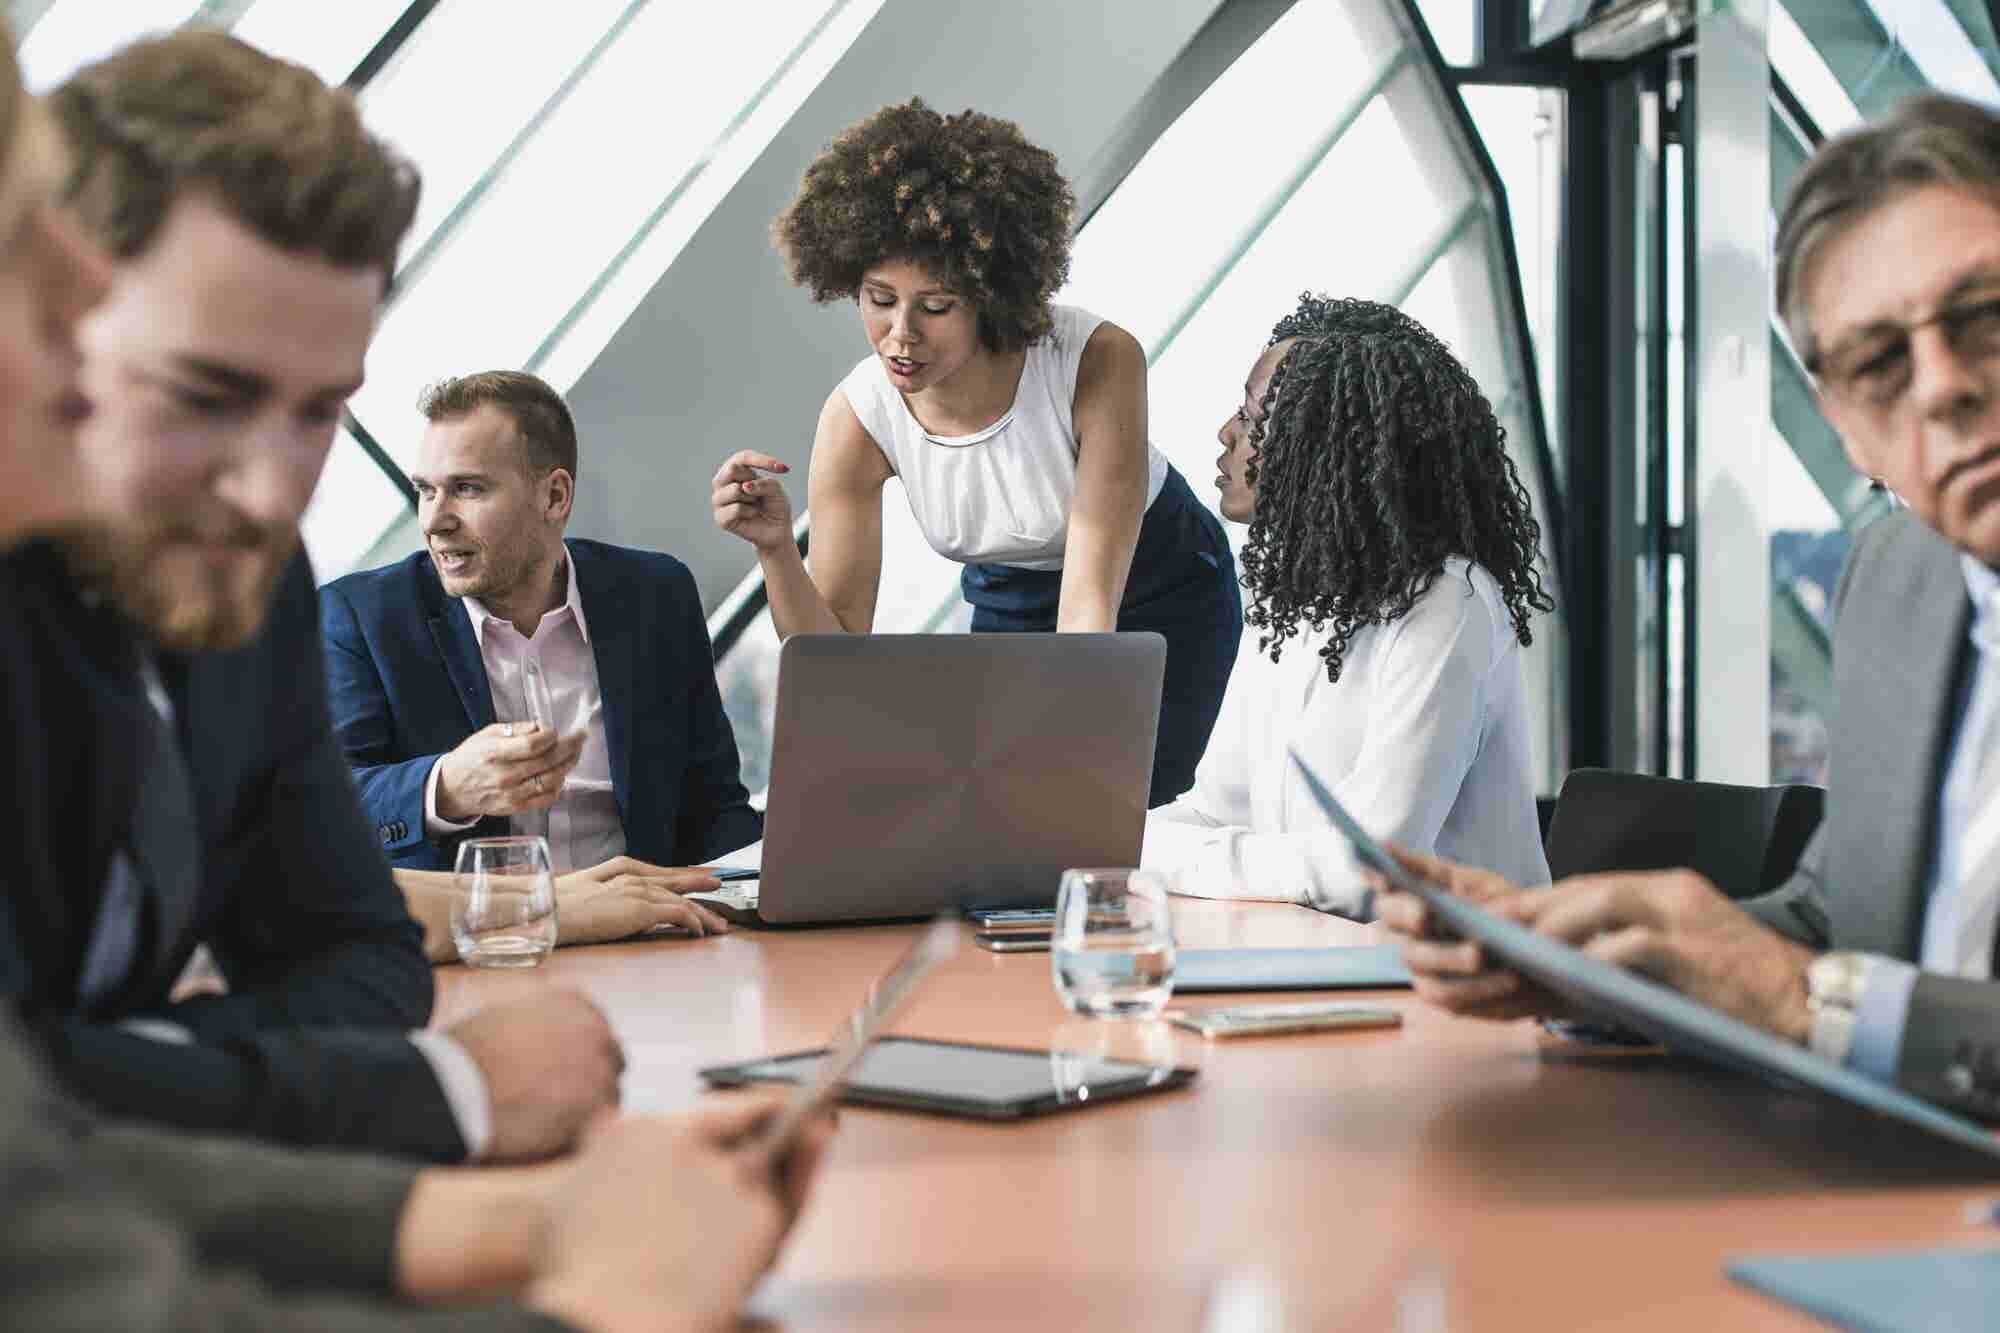 The Advisory Team Entrepreneurs Should Consider Adding to Their Business